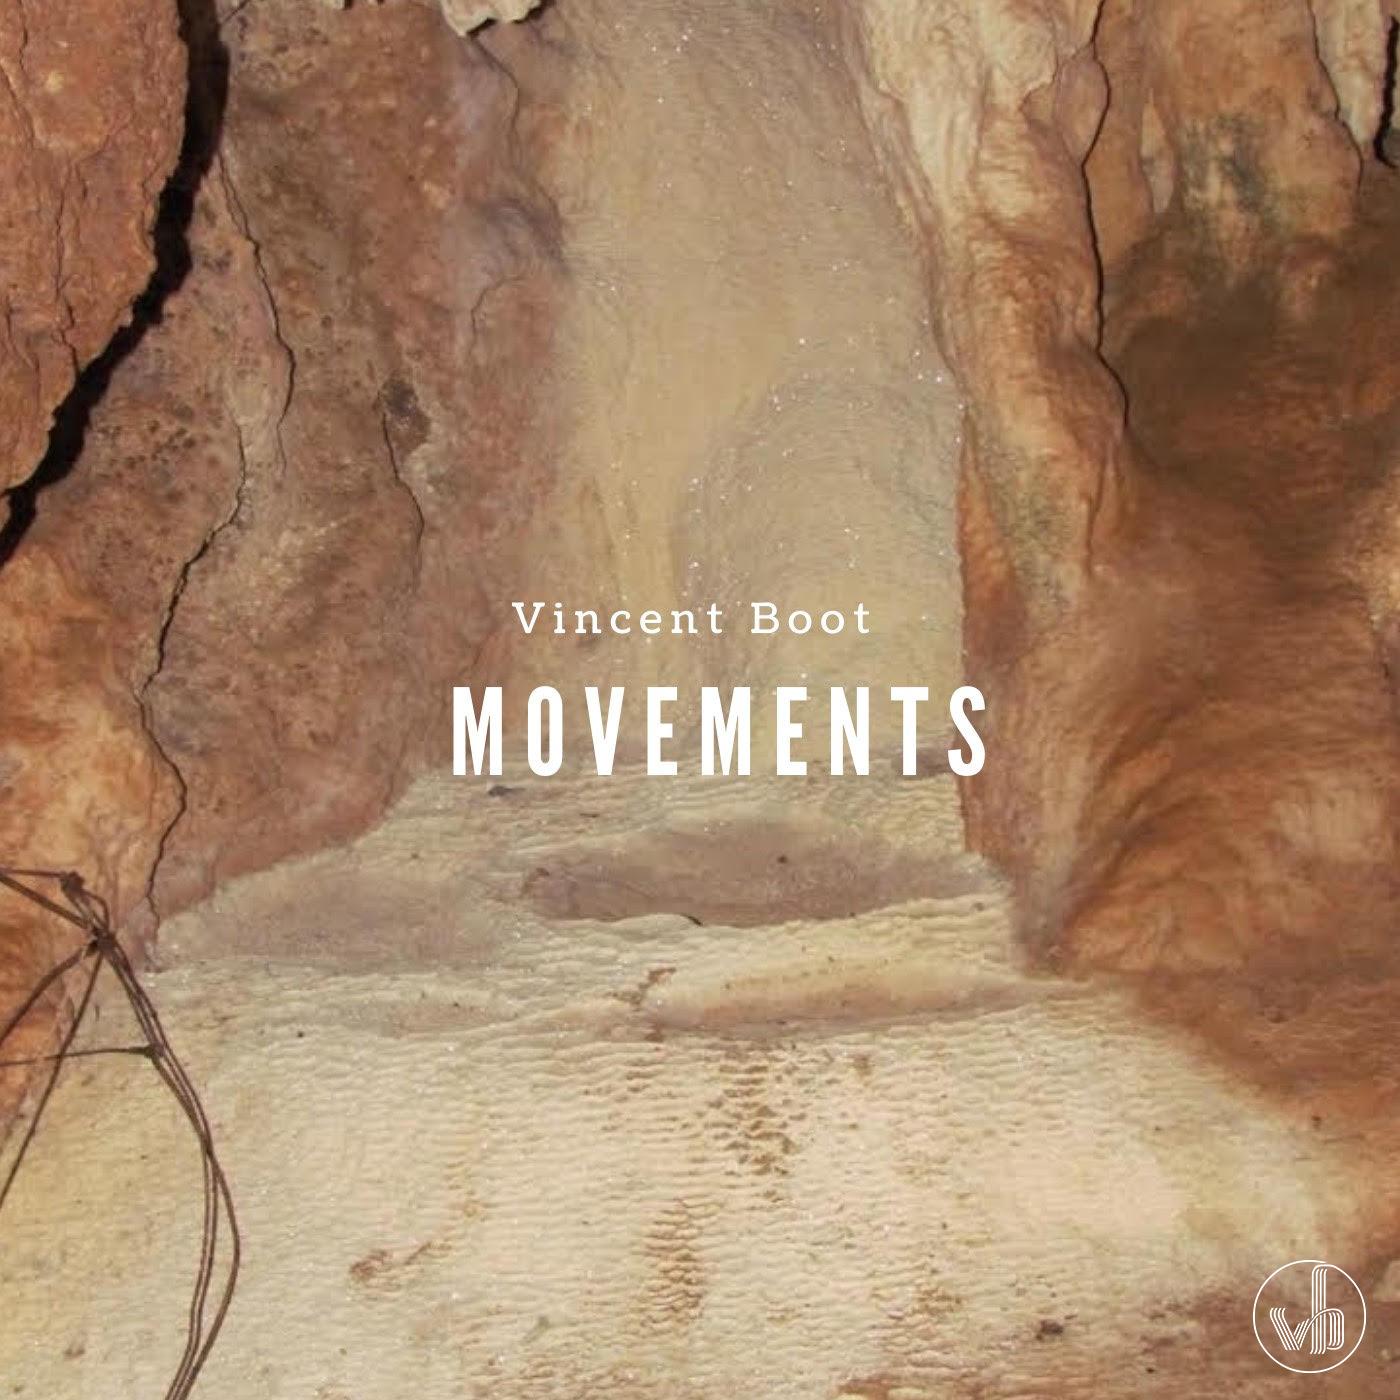 Vincent Boot - Movements